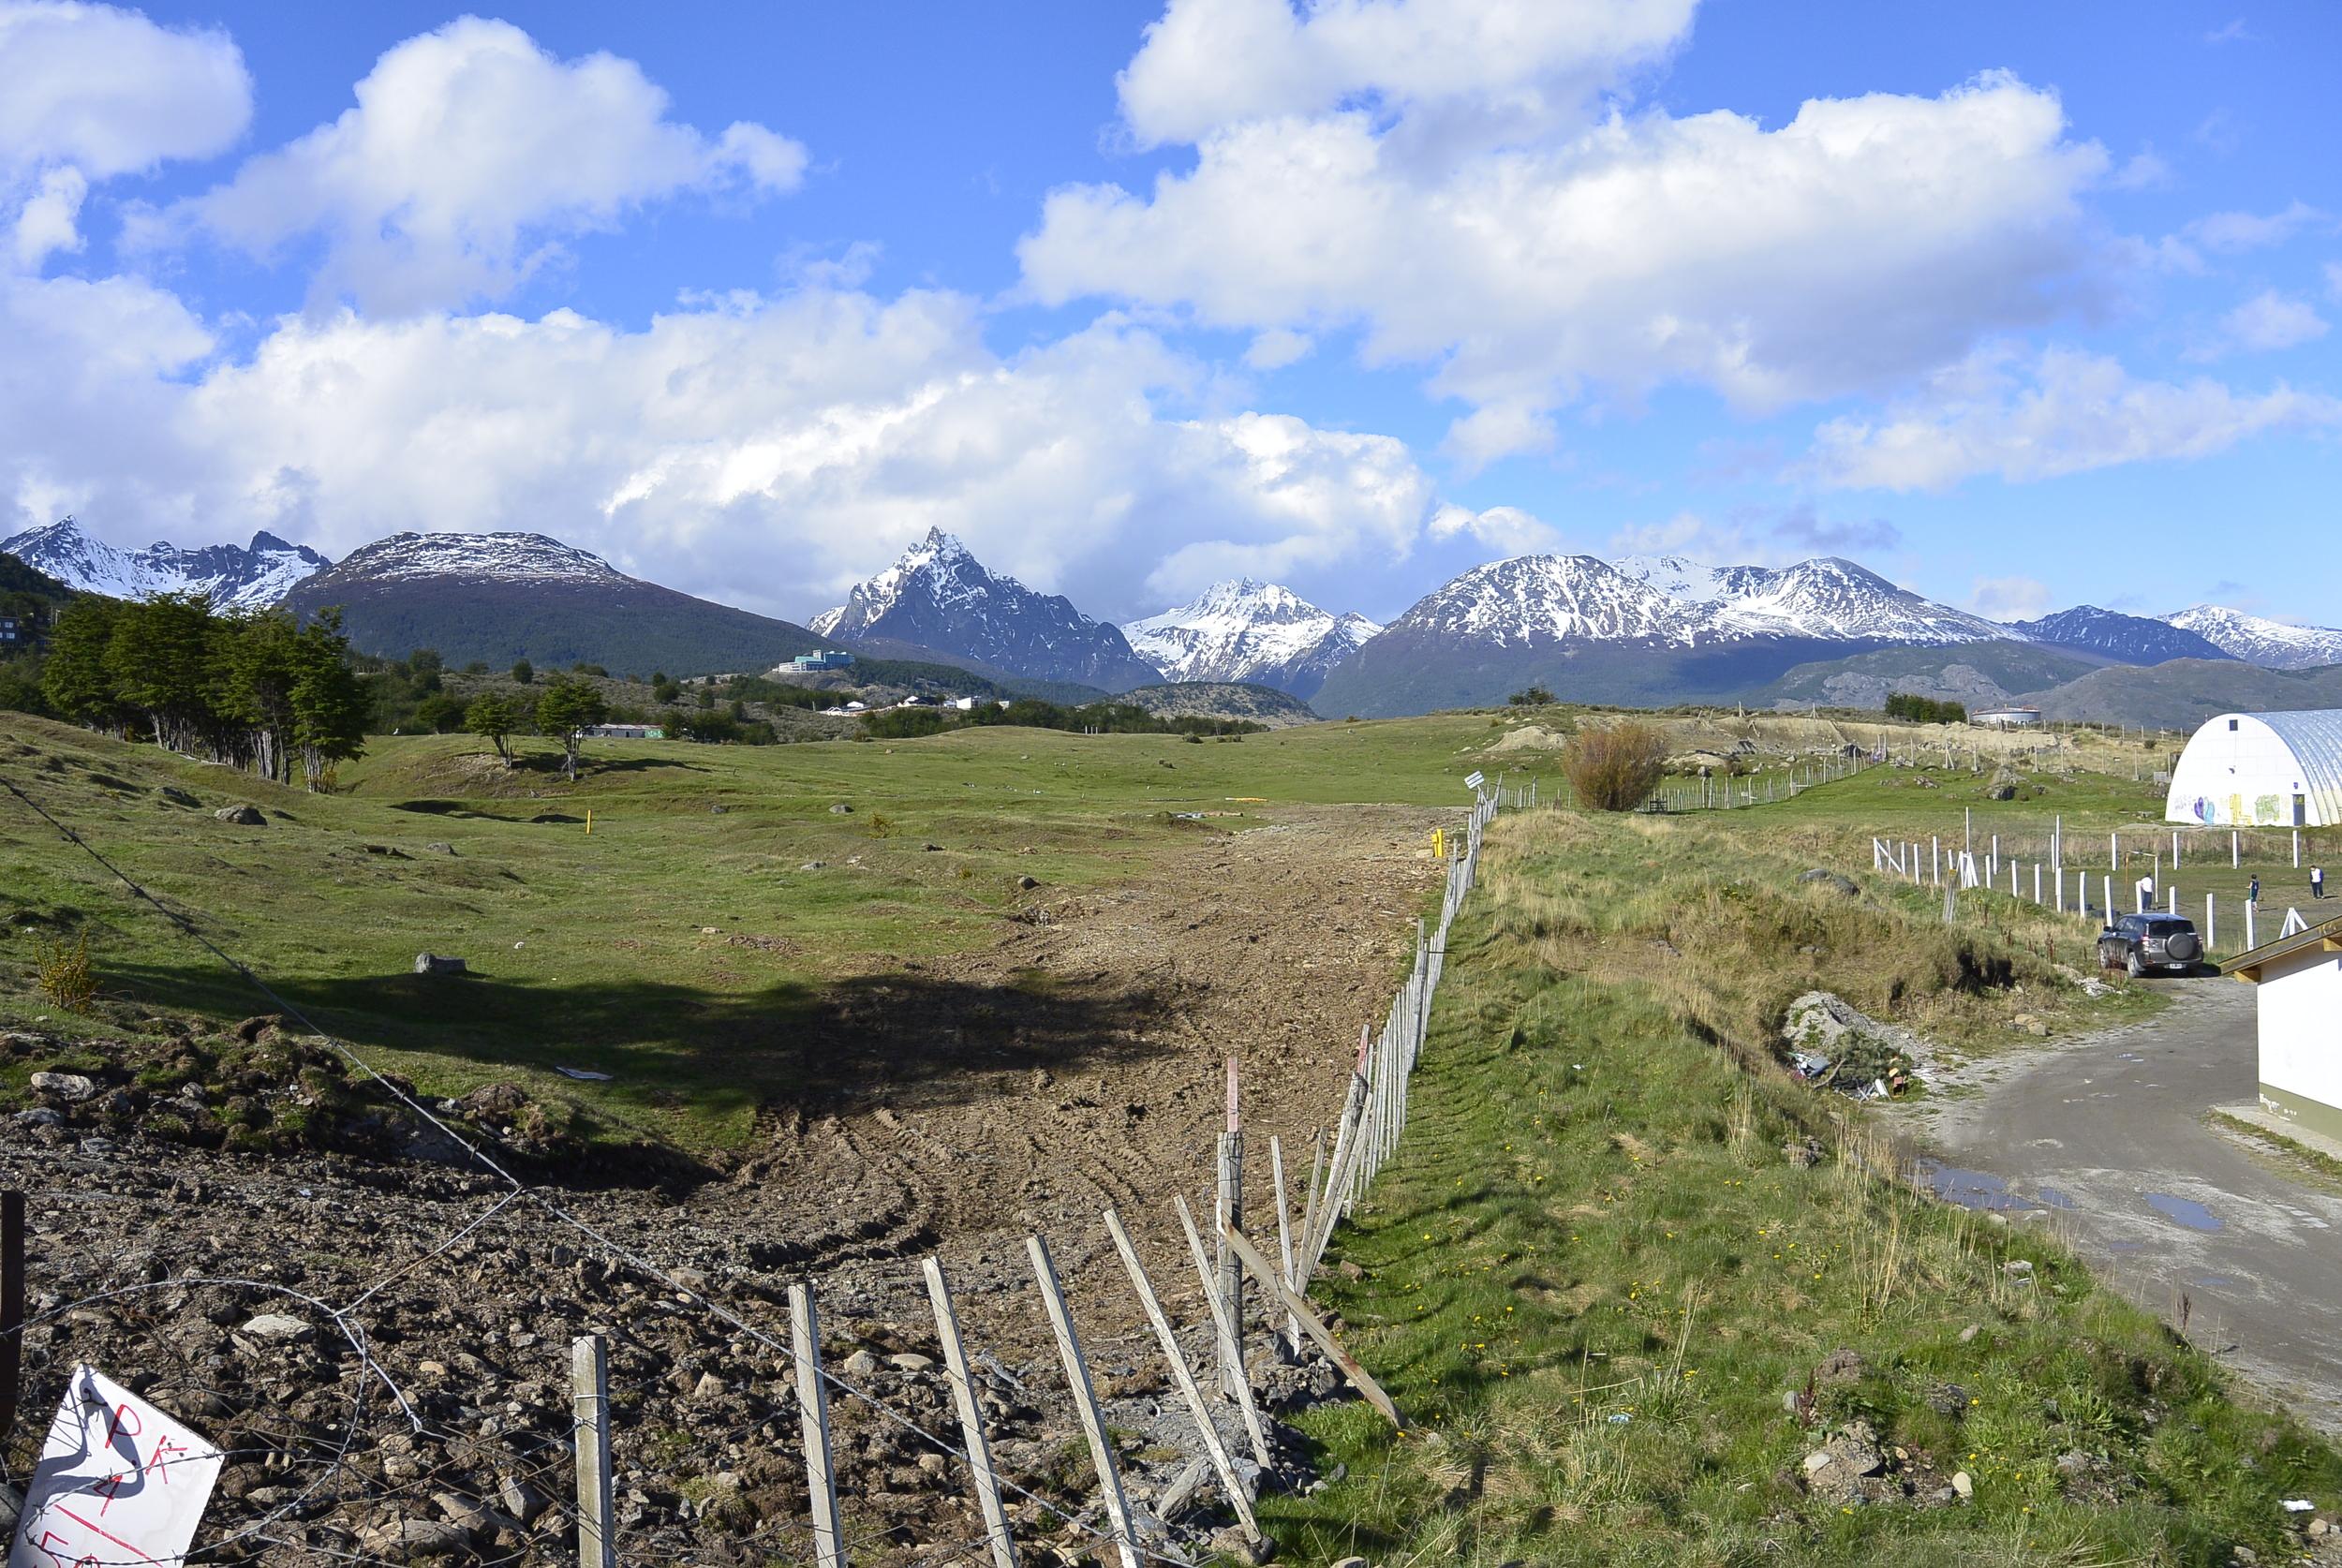 Ushuaia Argentina and Mountains